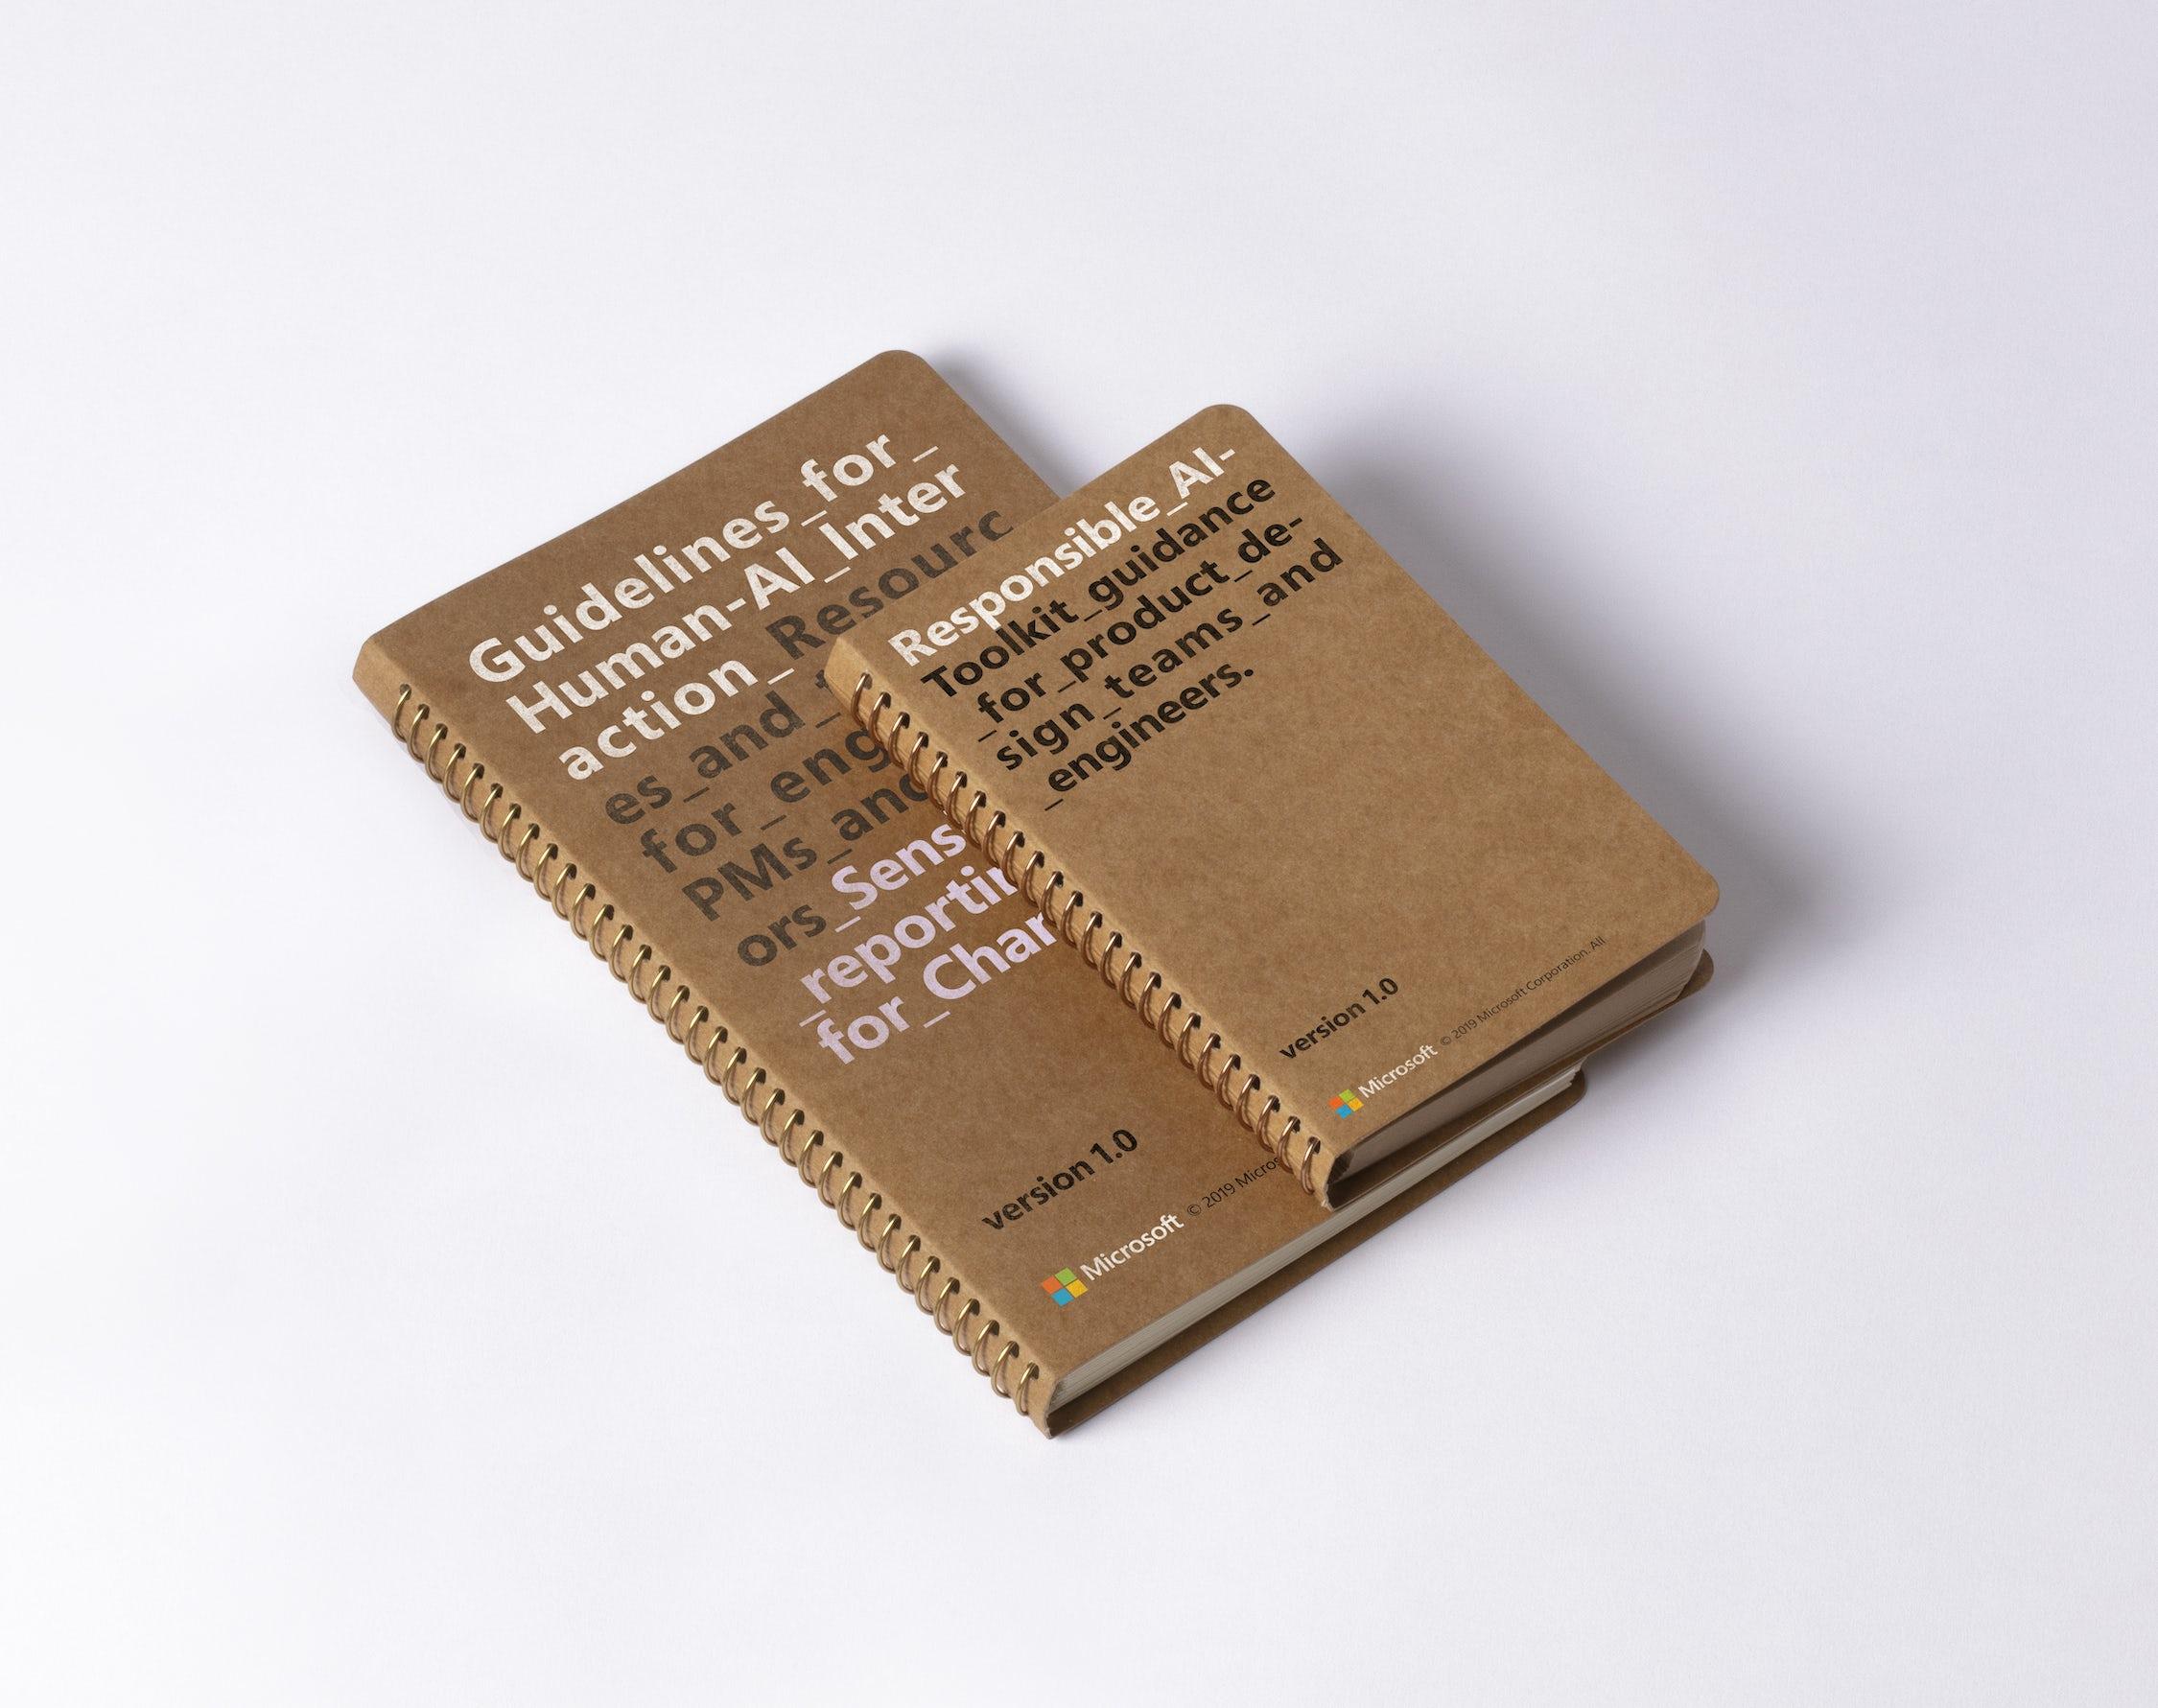 Microsoft Responsible AI event notebooks